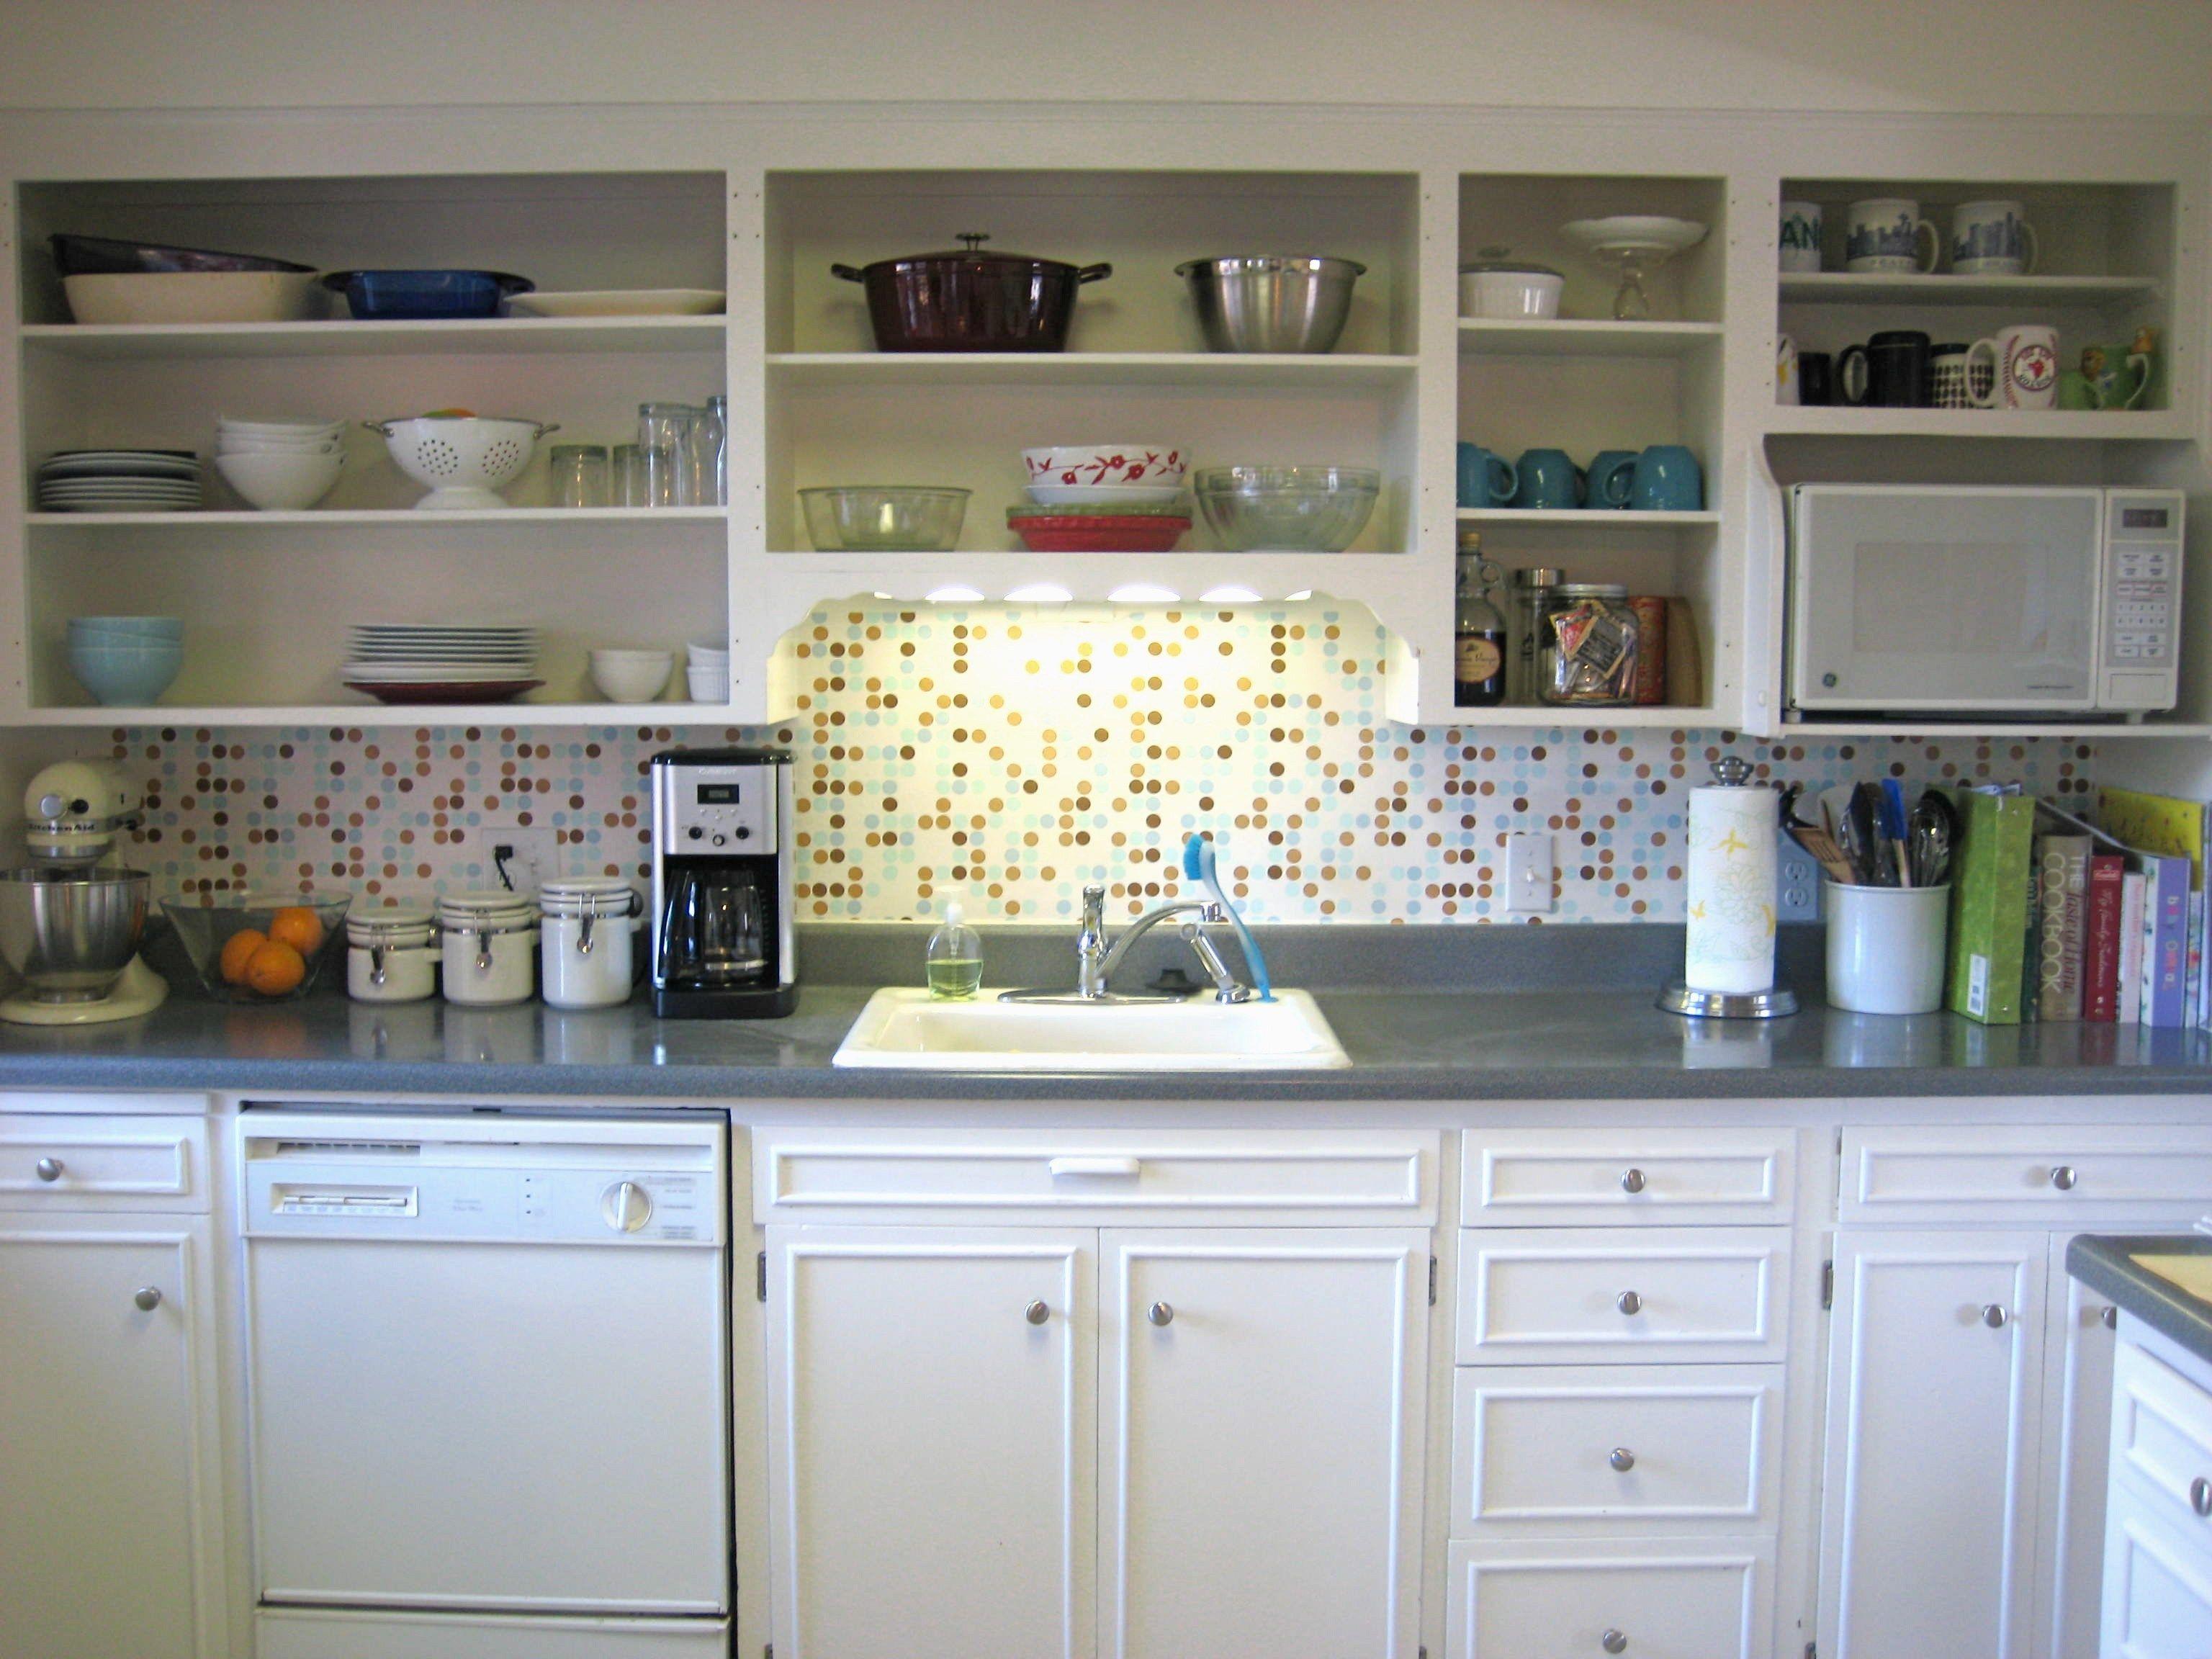 Image Result For Ikea Upper Kitchen Cabinets No Door Open Kitchen Cabinets Upper Kitchen Cabinets Kitchen Design Decor